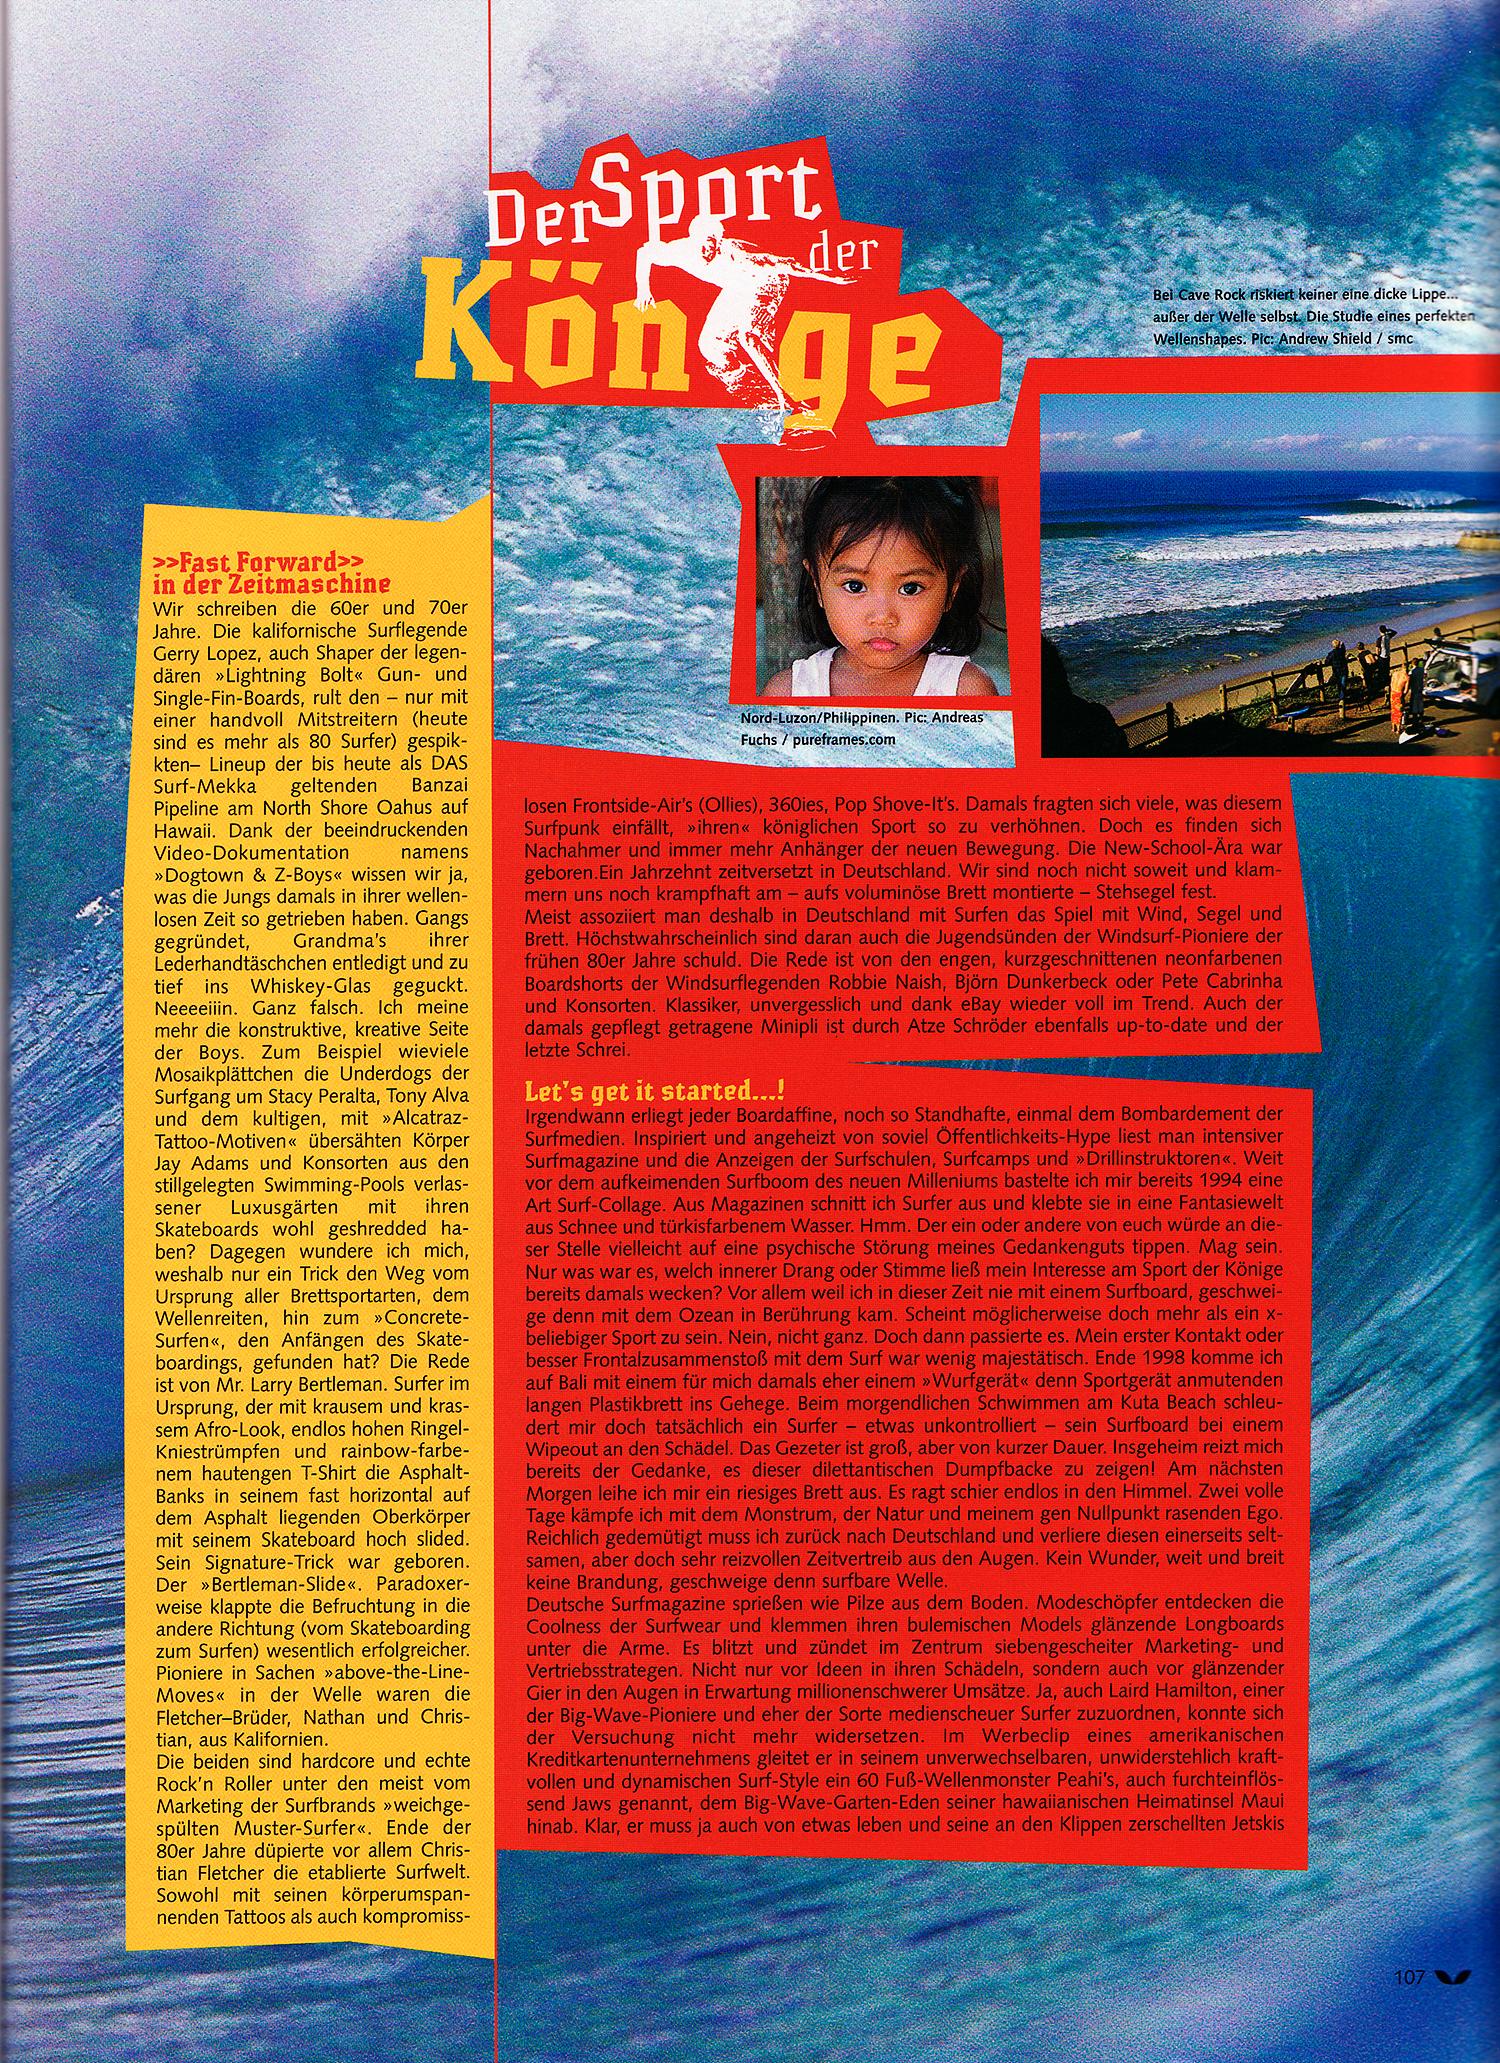 2005-06_Playboard-Inhalt04_A4-300dpi.jpg